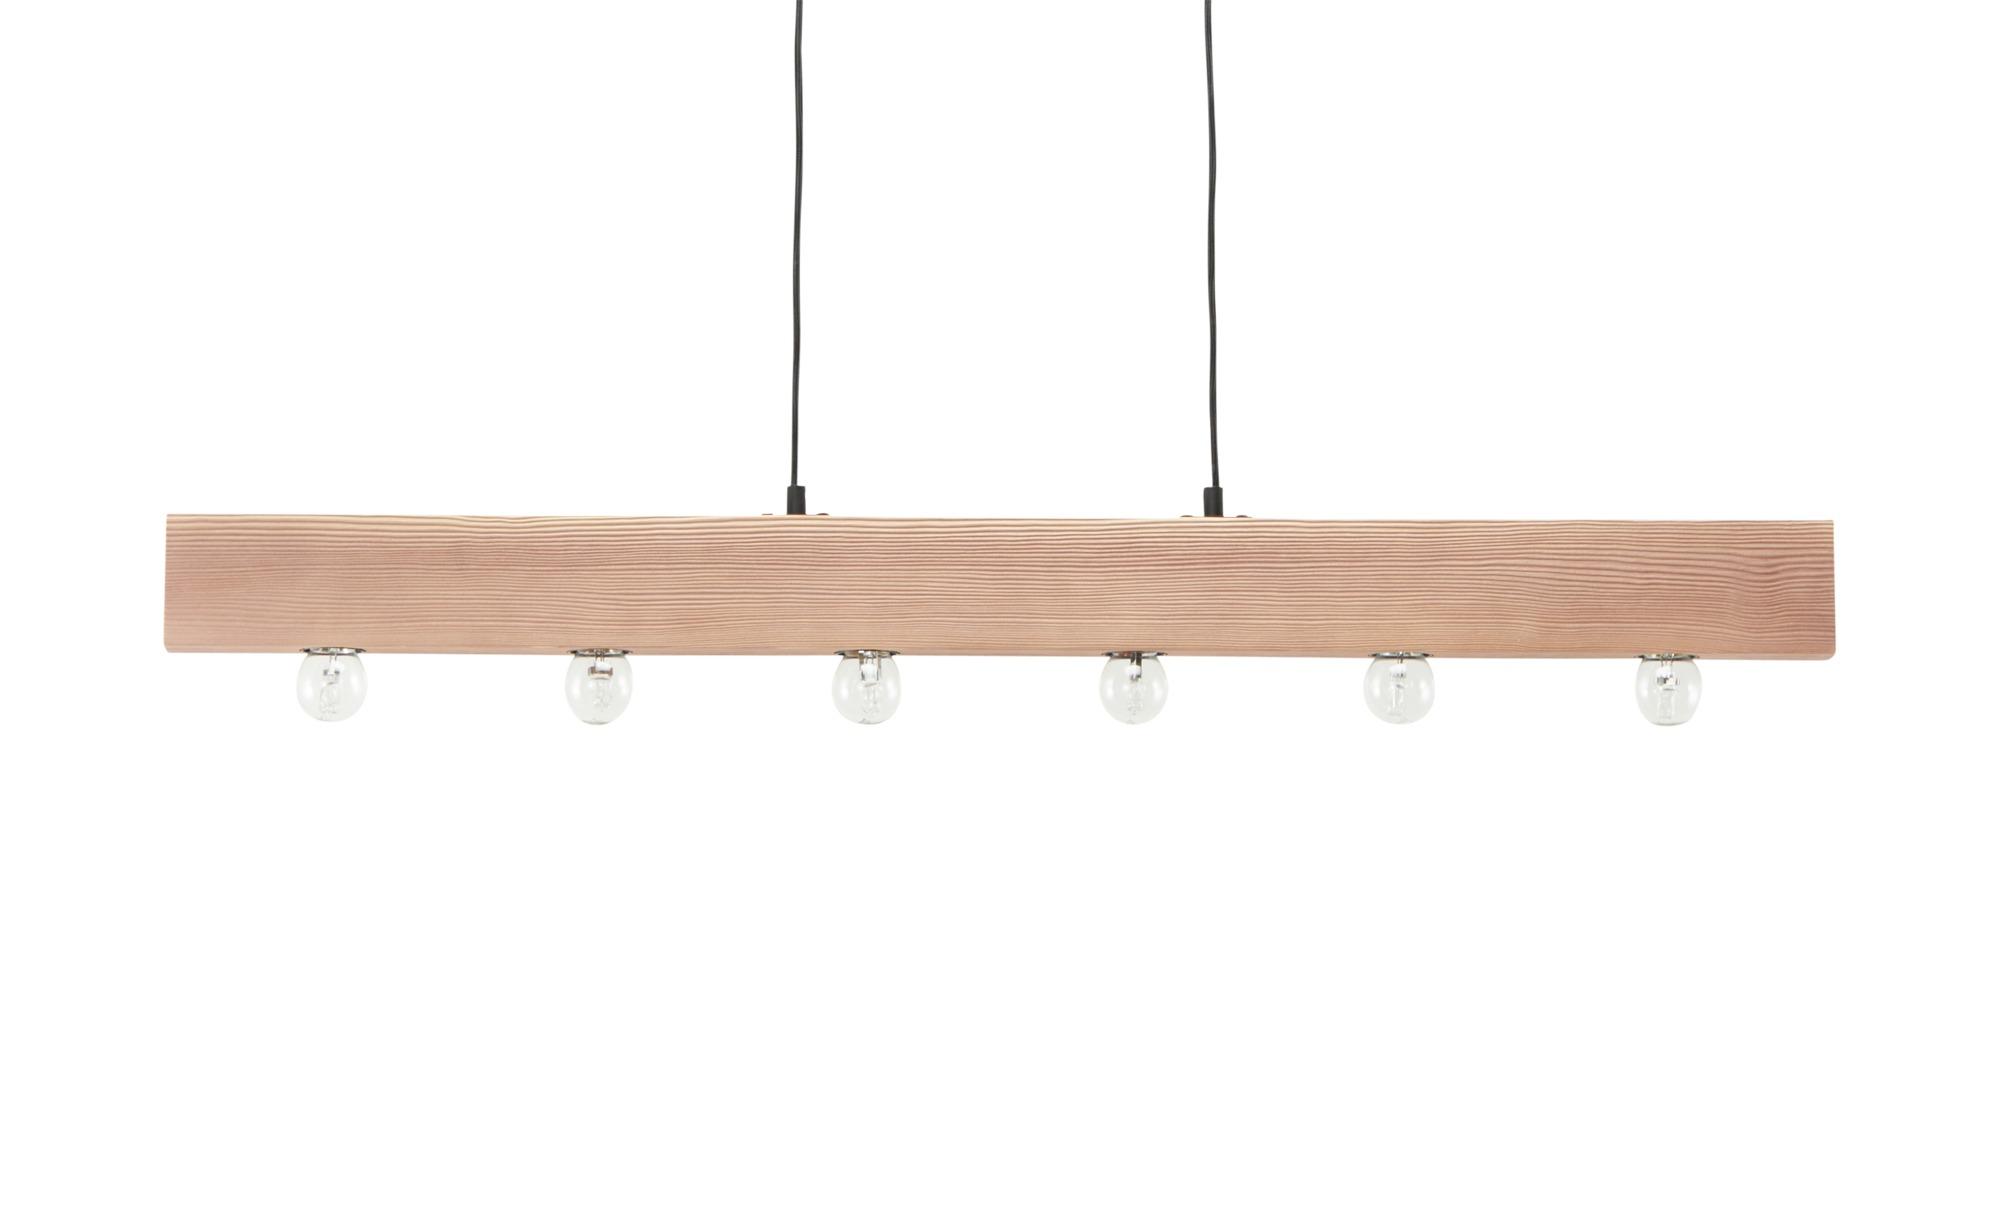 Holz-Pendelleuchte, 6-flammig ¦ holzfarben ¦ Maße (cm): B: 5 H: 8 Lampen & Leuchten > Innenleuchten > Pendelleuchten - Höffner